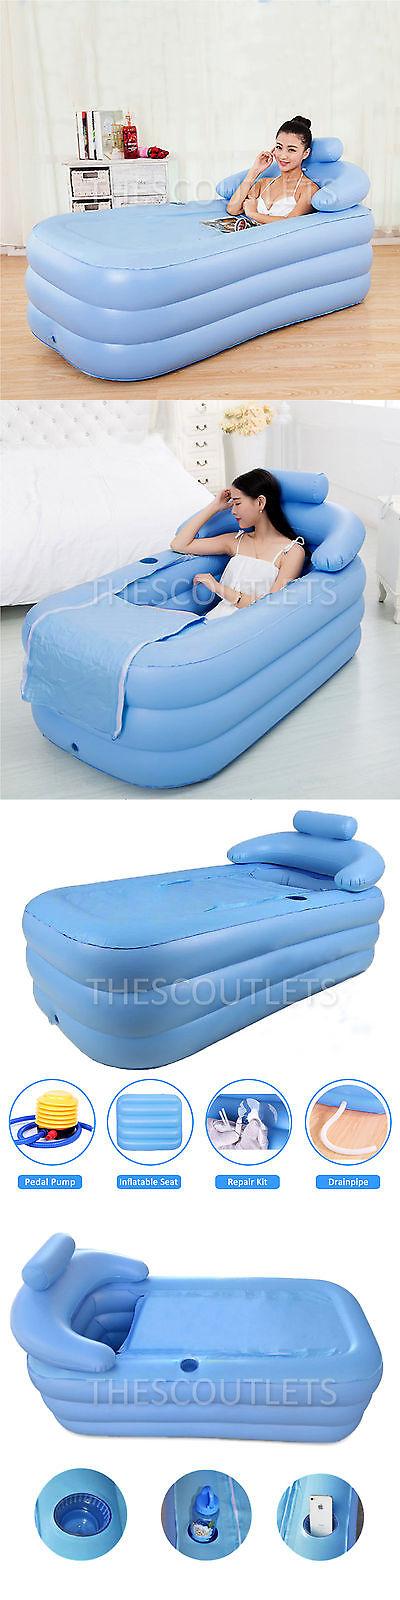 Bathtubs 42025: Adult Pvc Folding Portable Inflatable Bathtub Spa ...